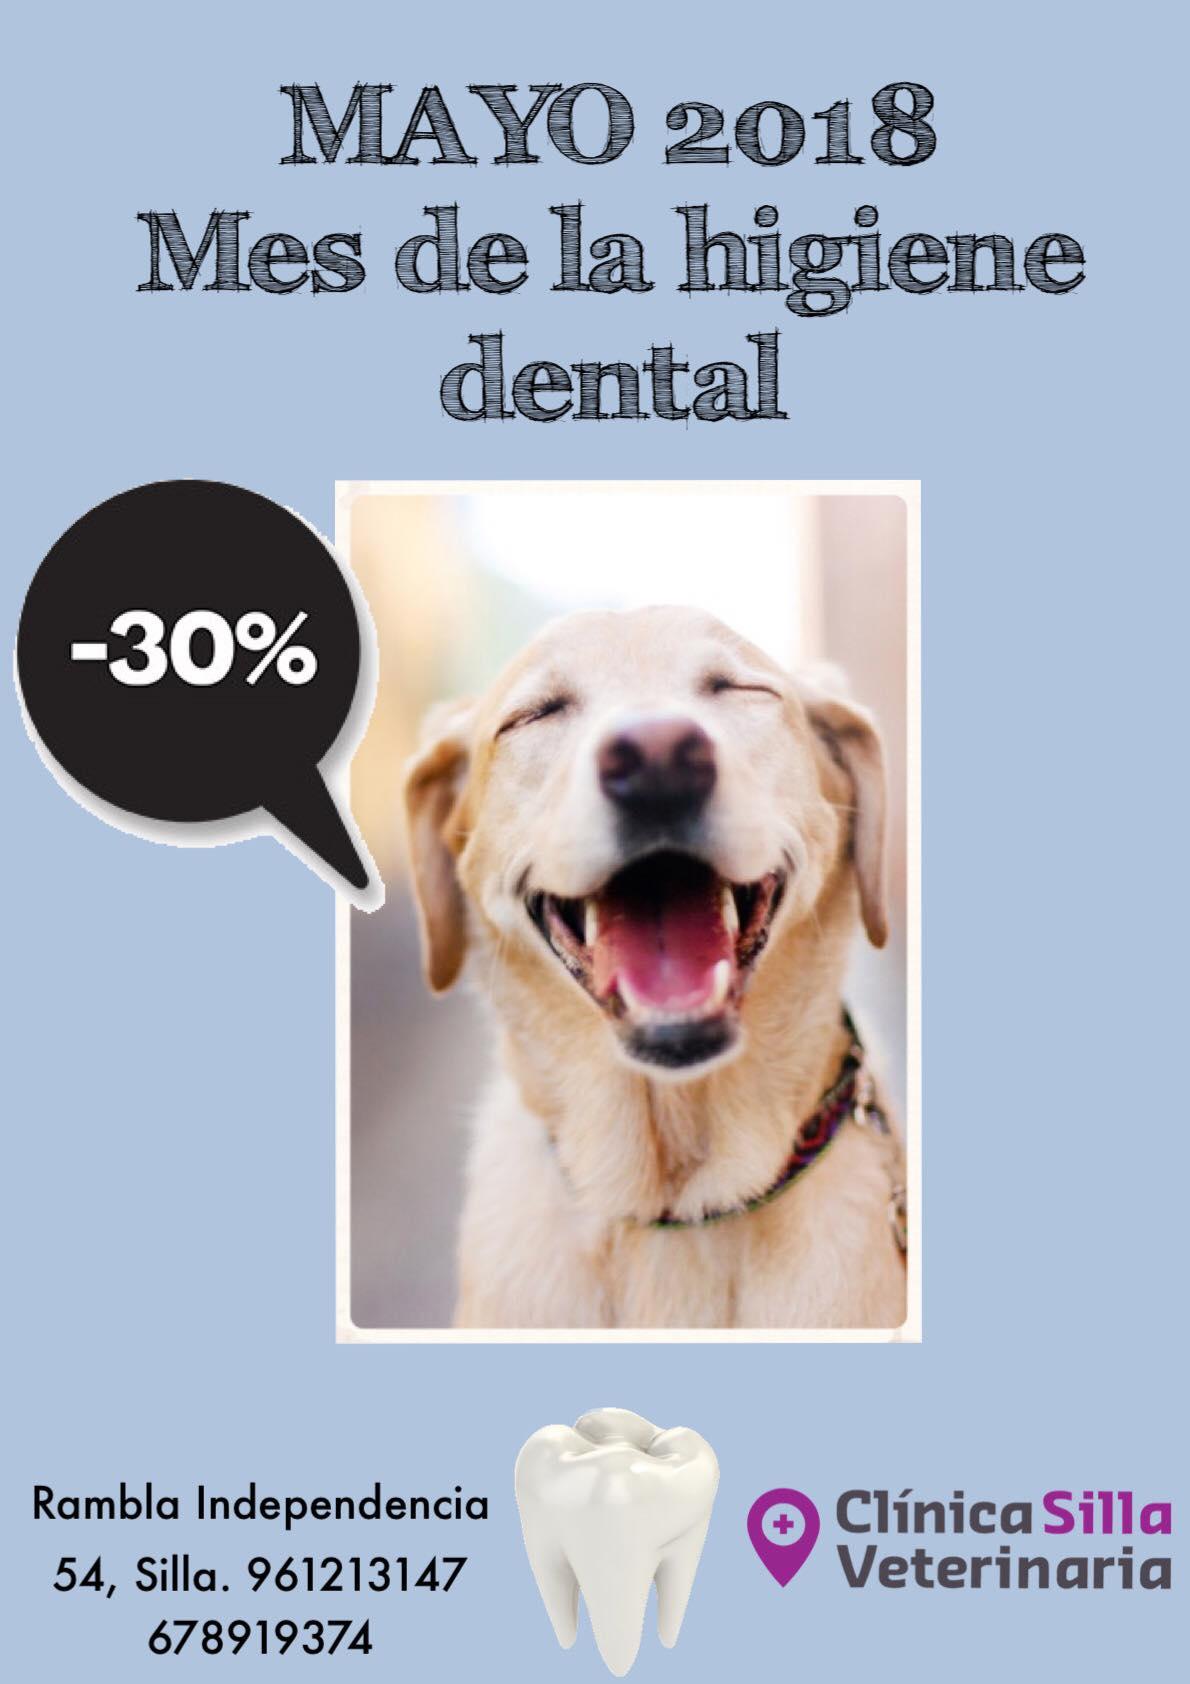 Clinica veterinaria silla mayo mes de la higiene dental - Clinica veterinaria silla ...